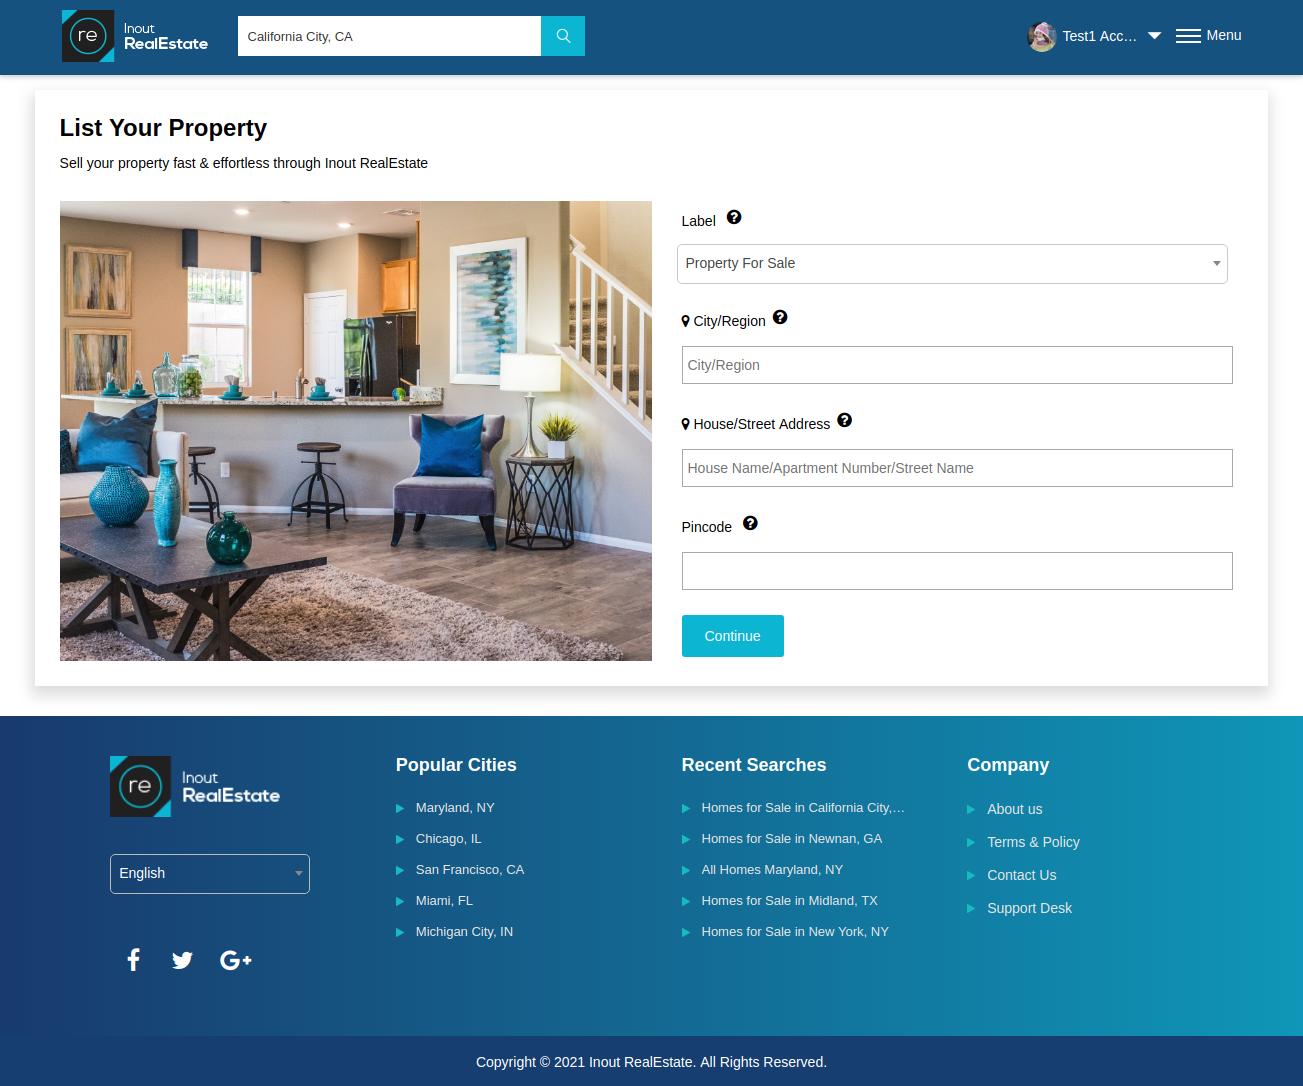 Inout RealEstate - Map Based Advanced Real Estate Portal - Screenshot 5